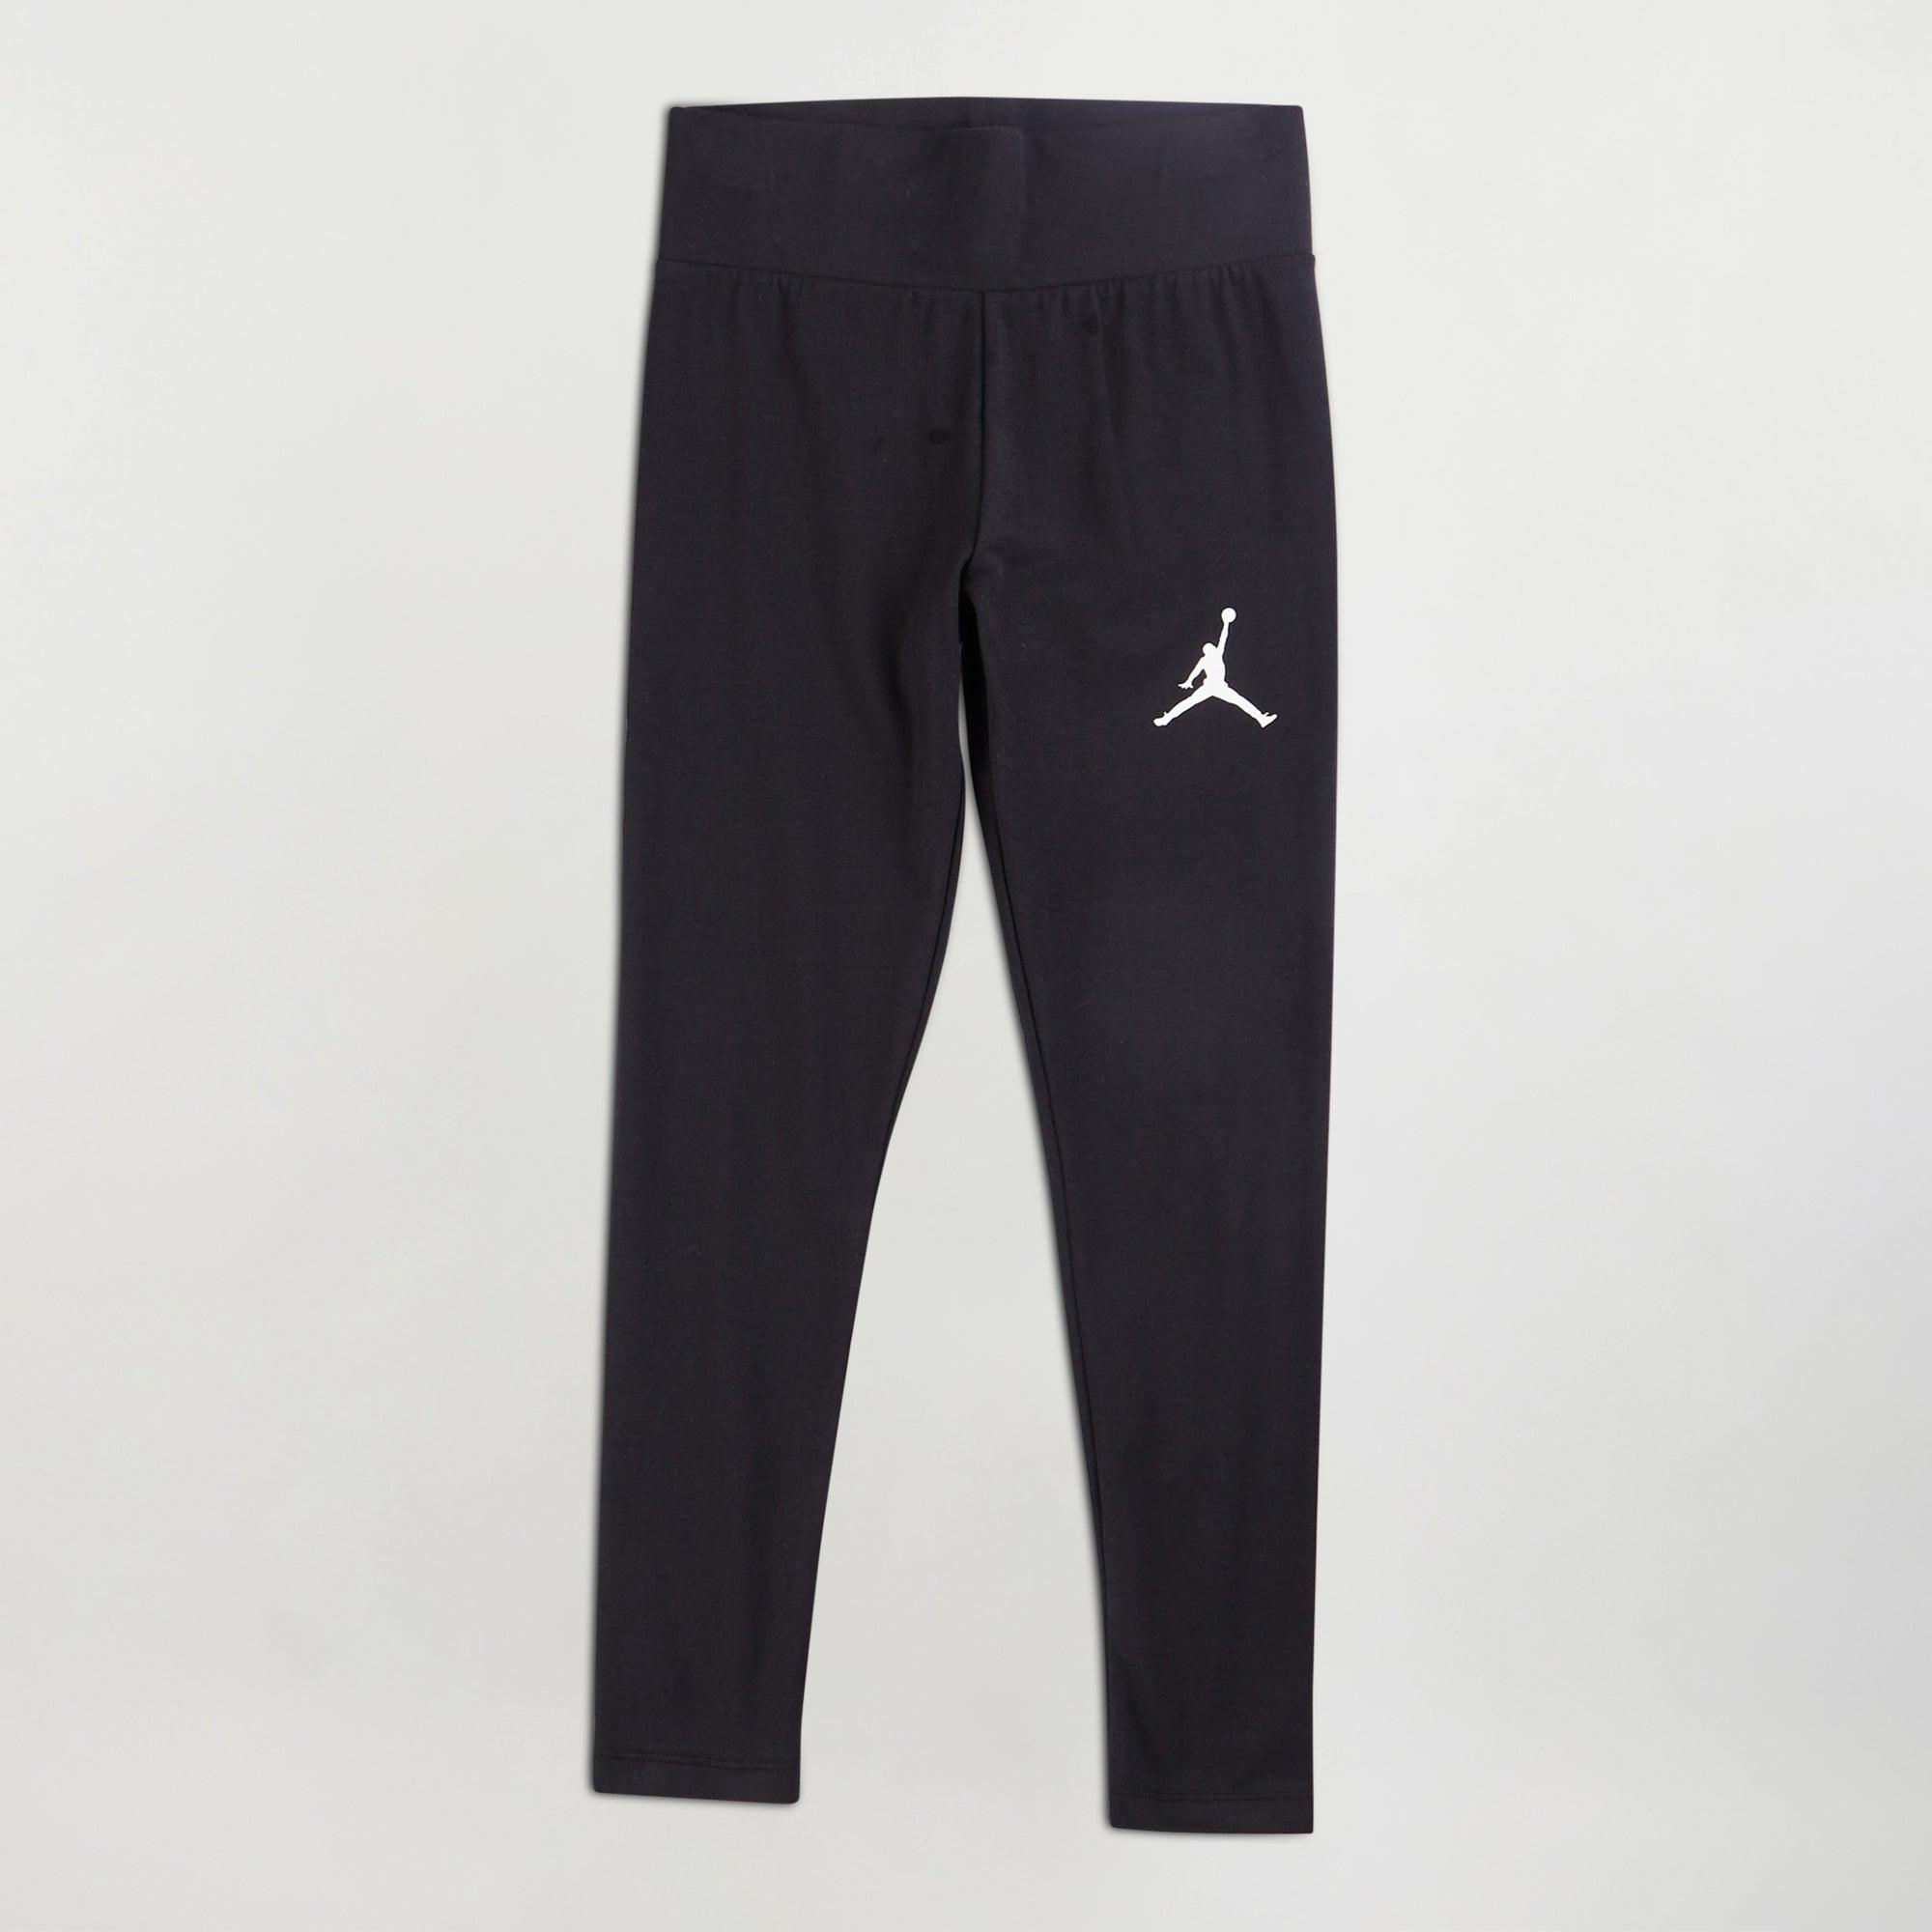 Jordan Jumpman Pantalones escolares